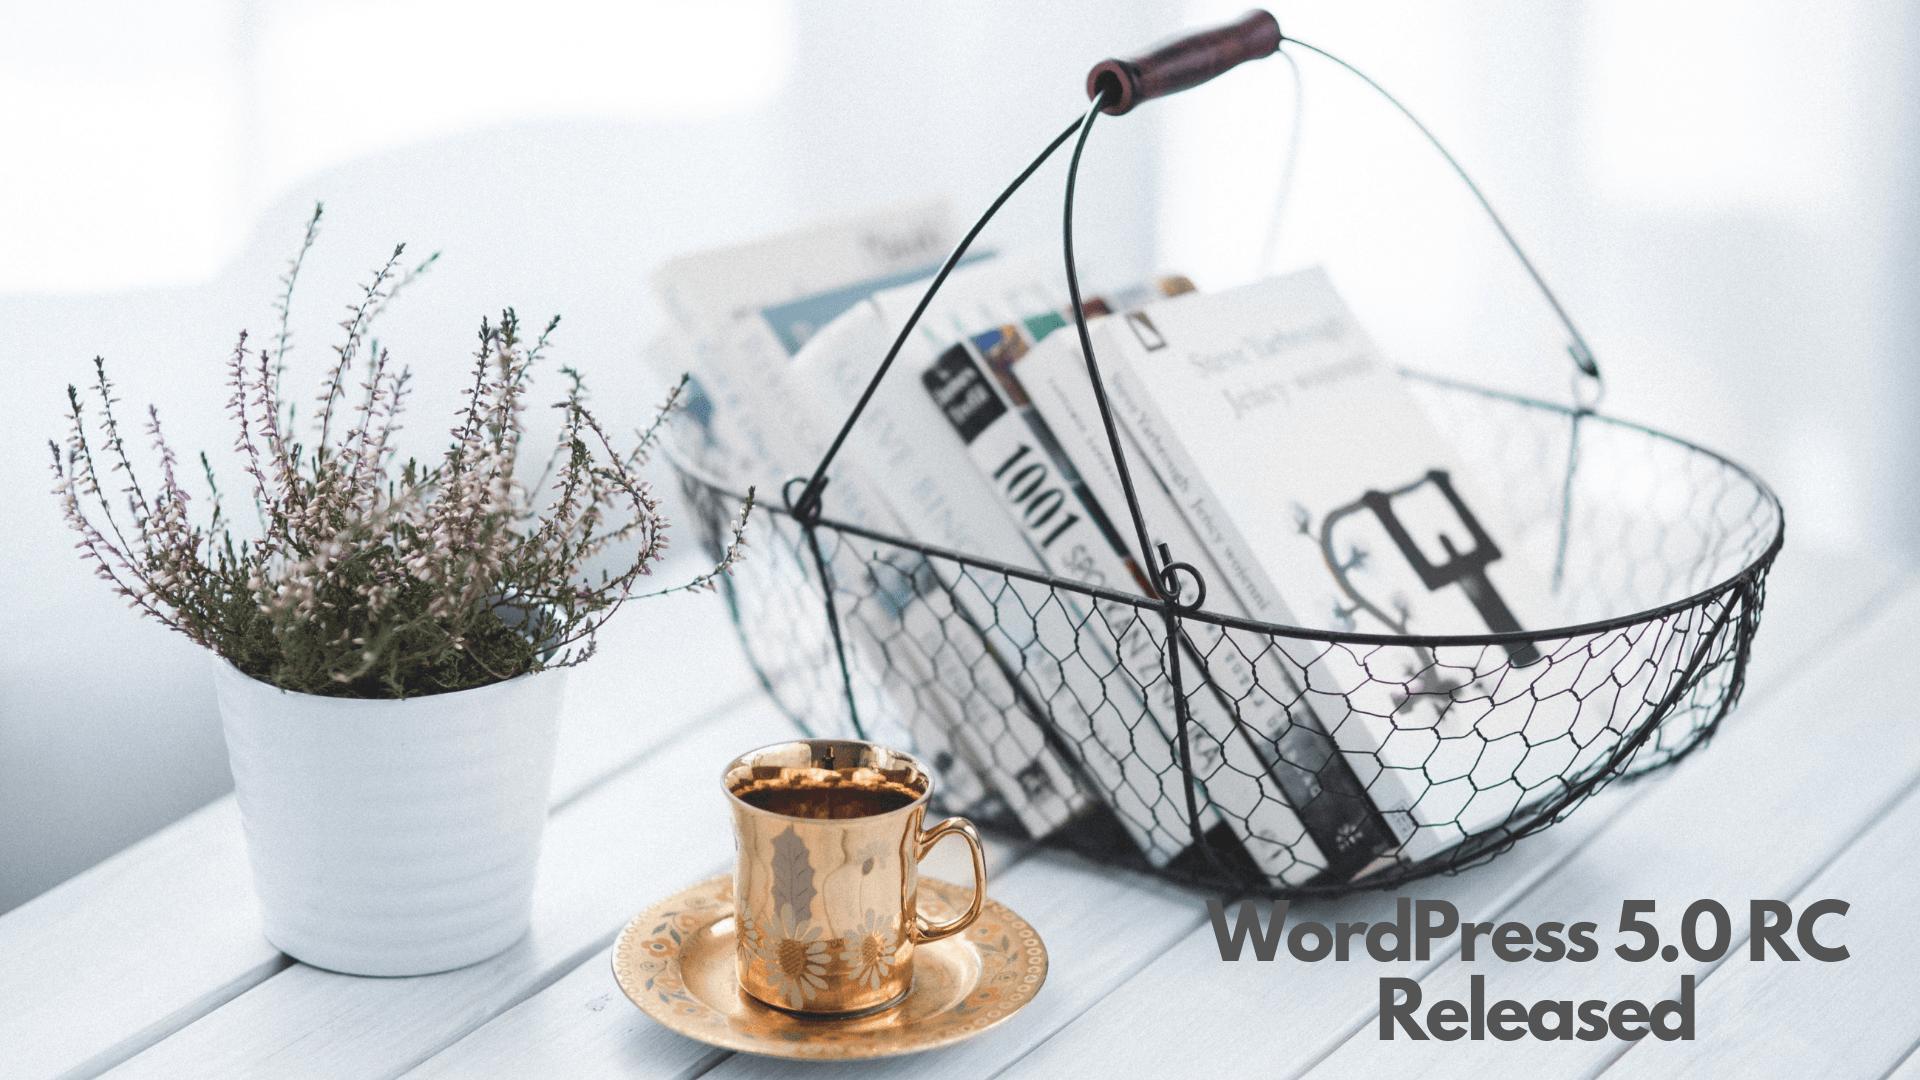 WordPress 5.0 RC released!